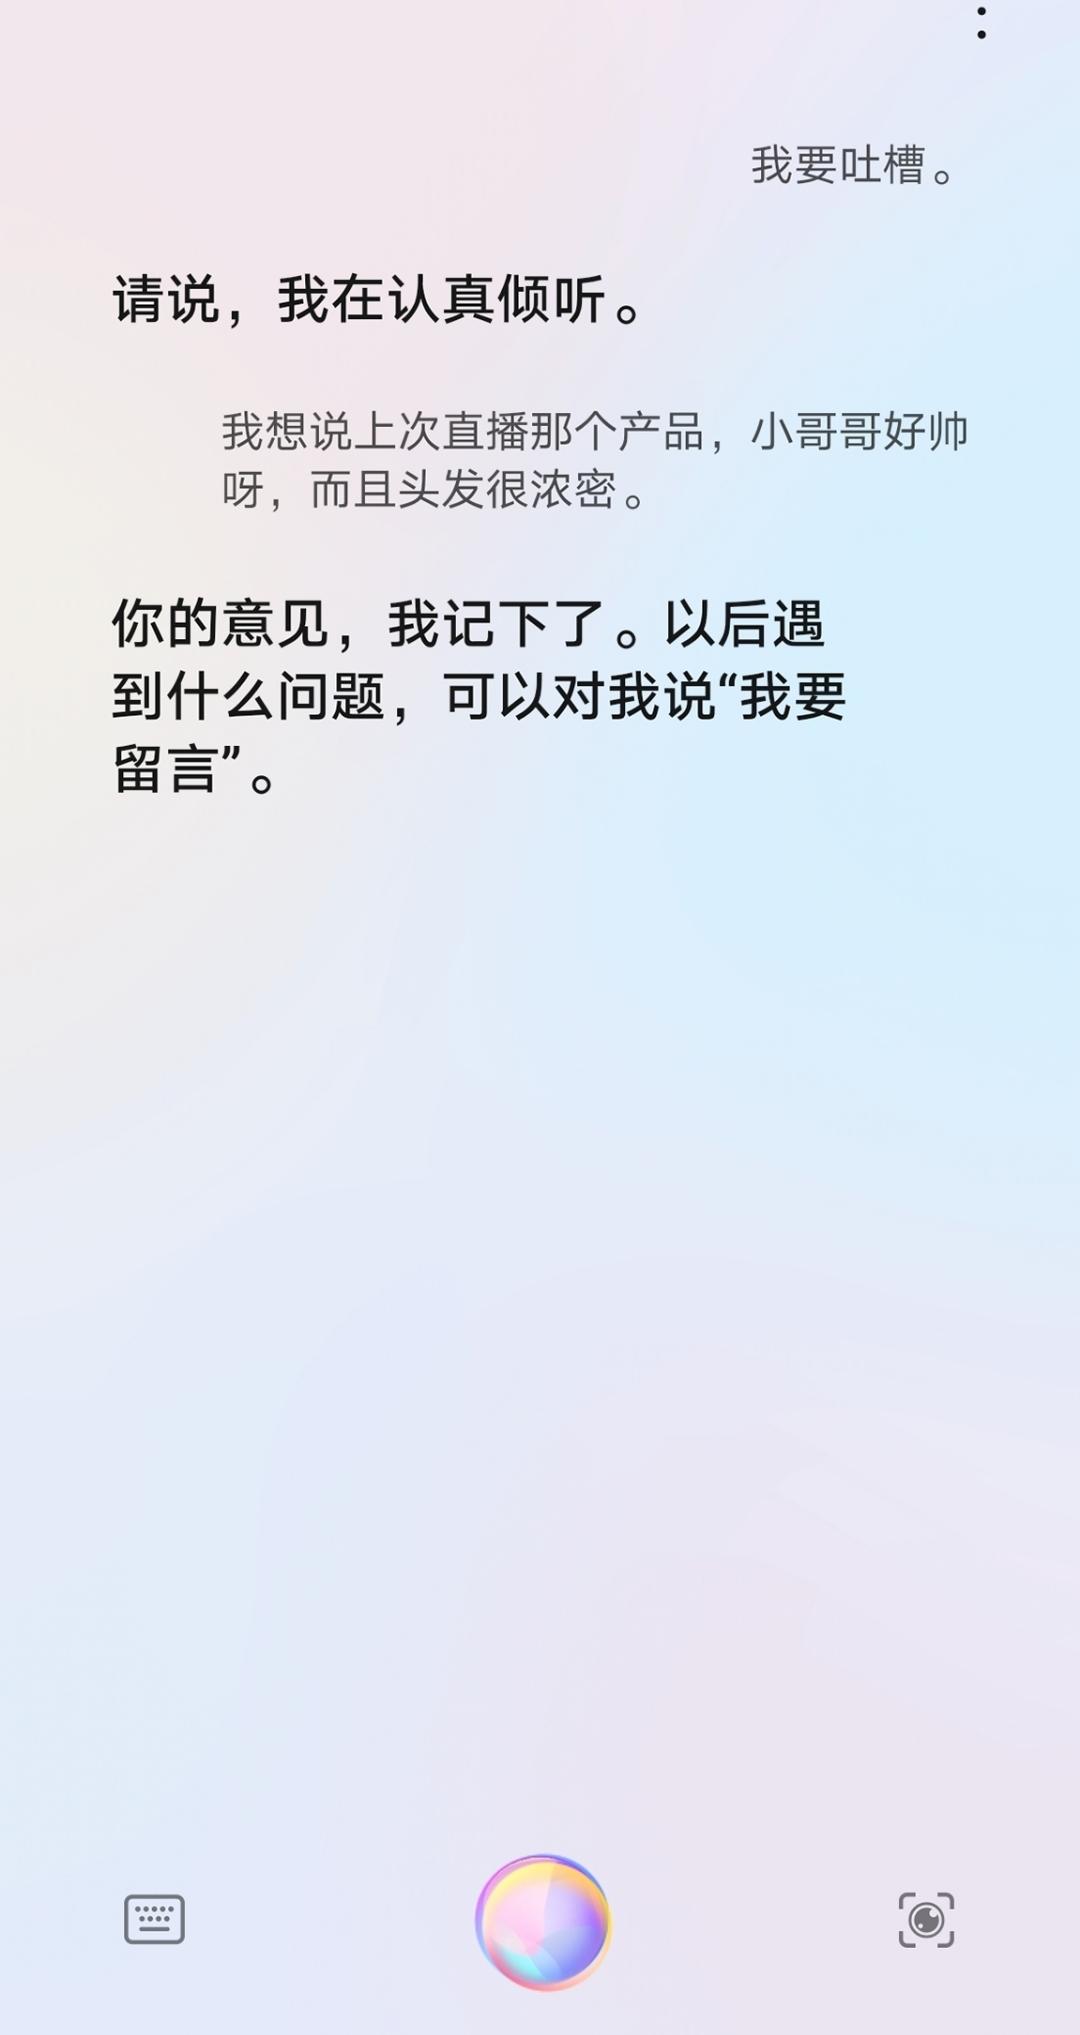 Screenshot_20200515_120920_com.huawei.vassistant_mh1589516165043.jpg